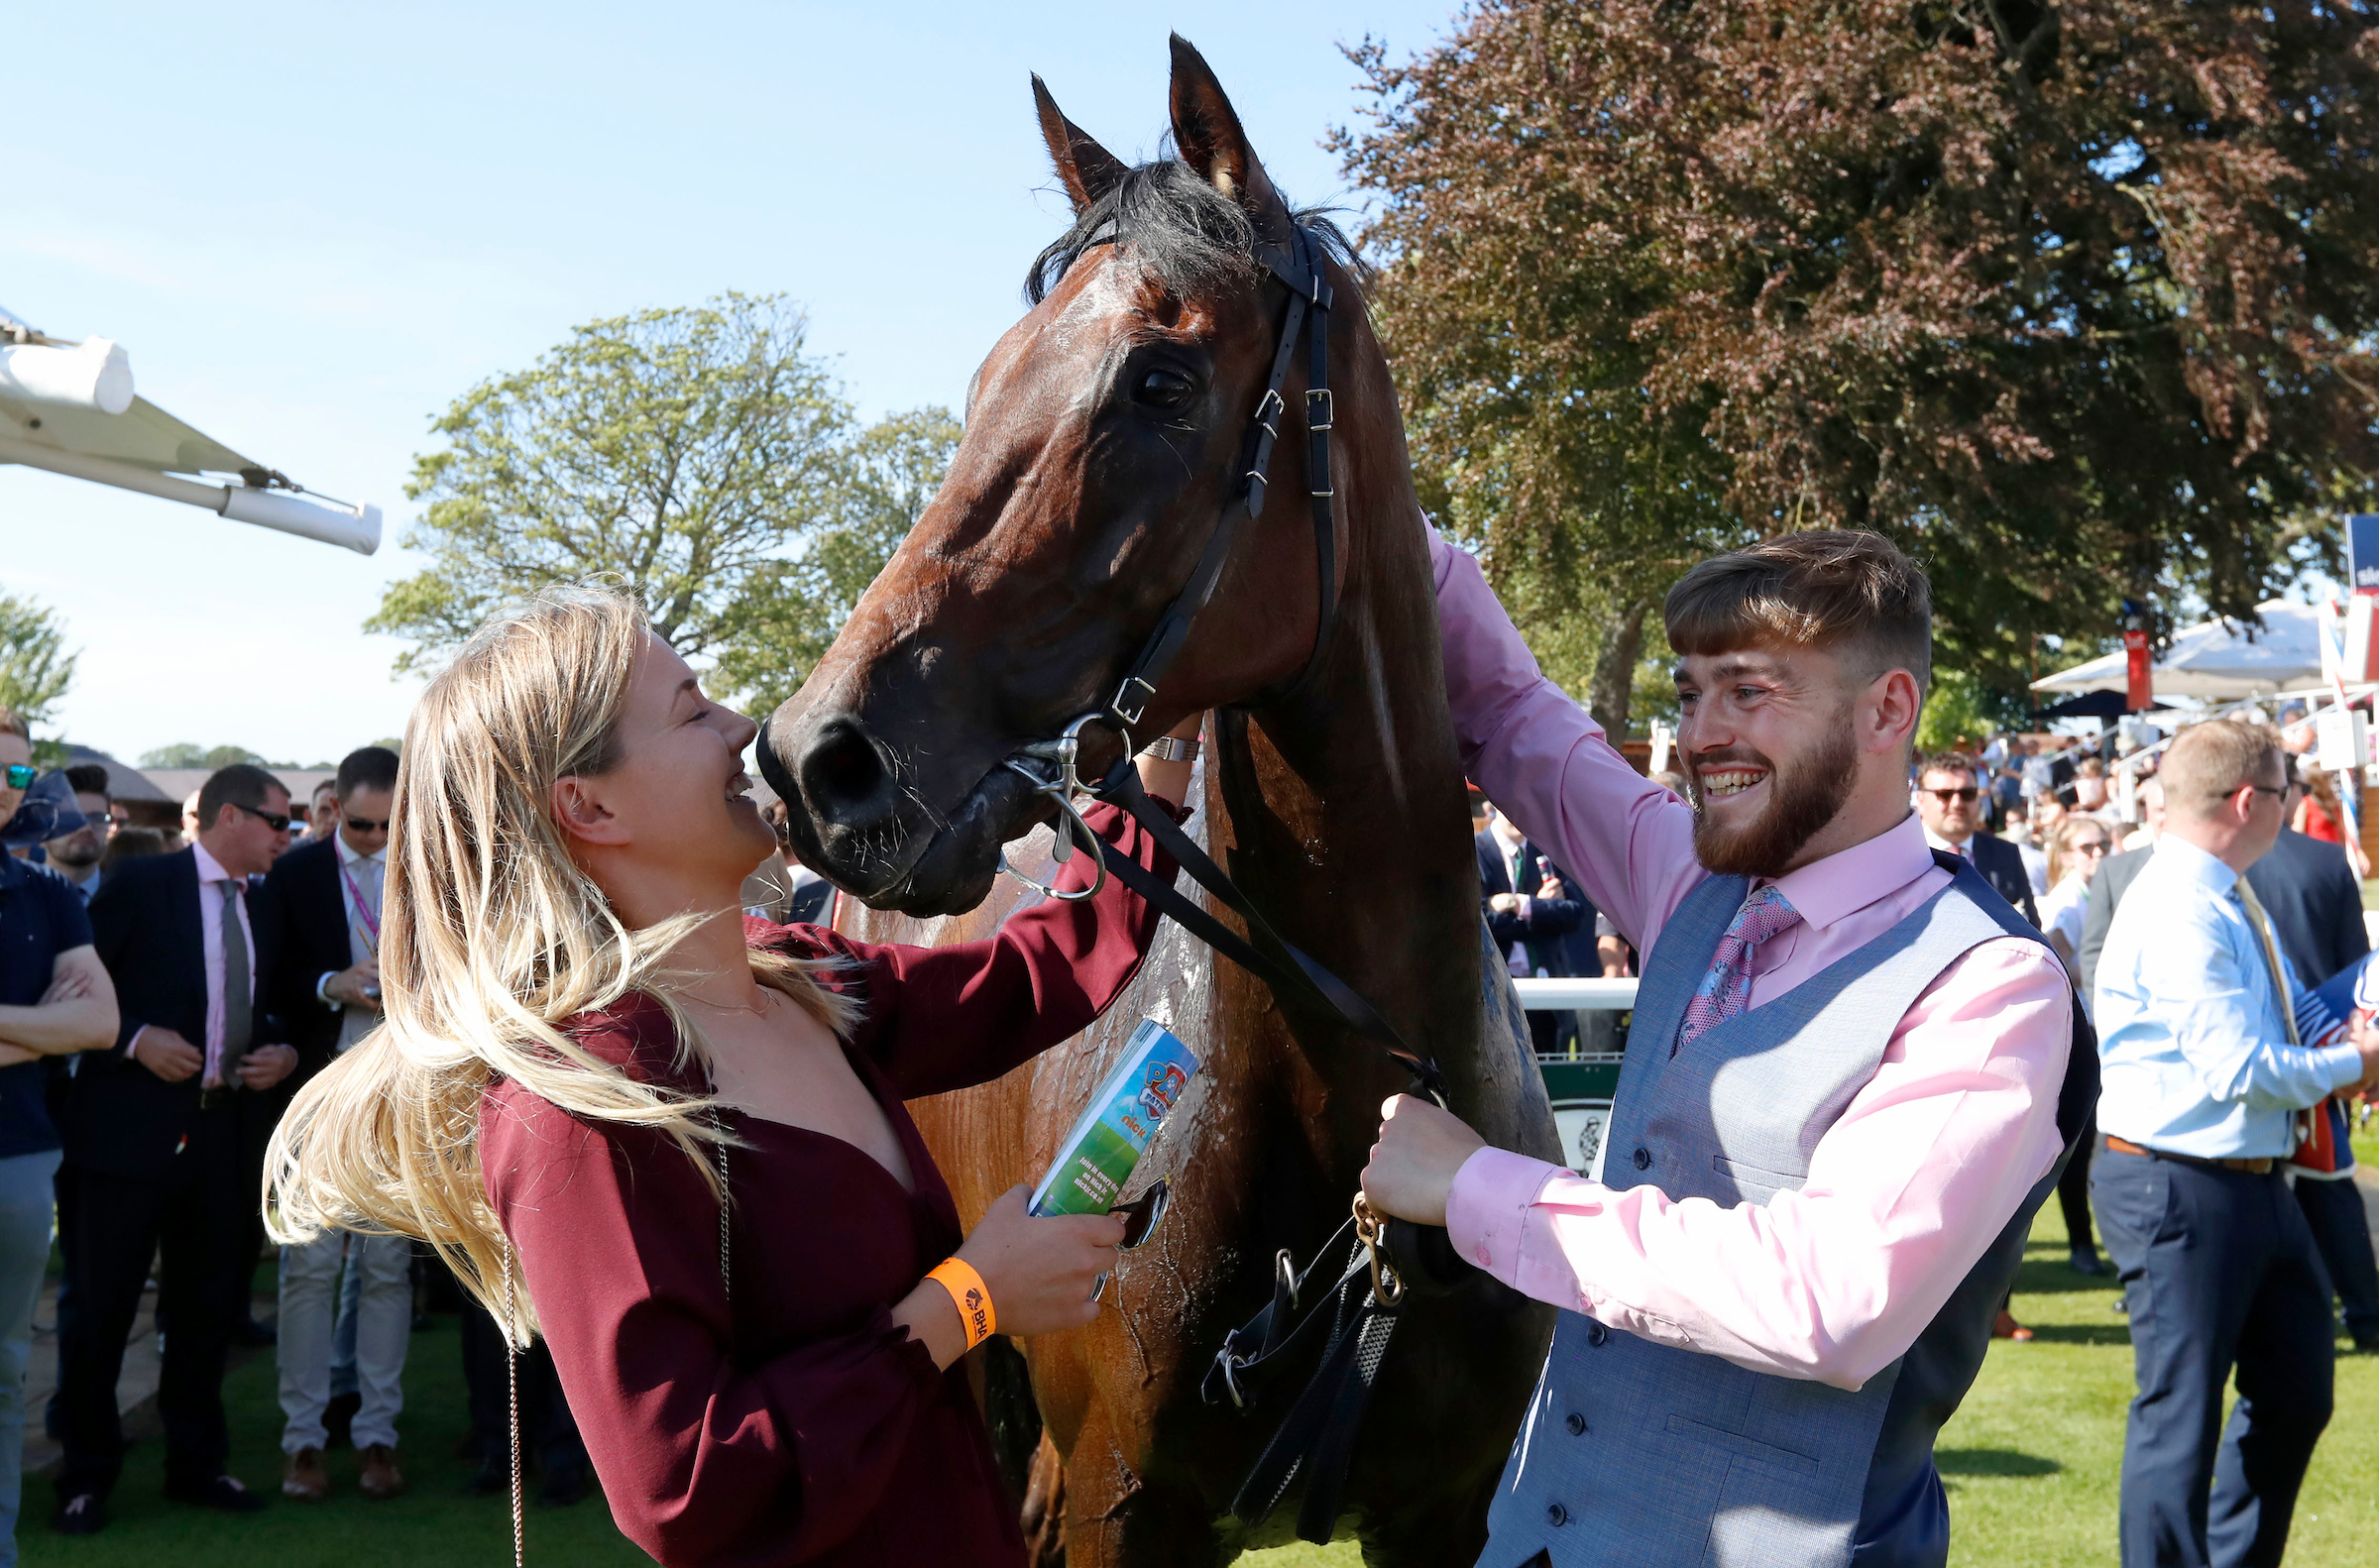 Yorkshire Ebor Festival: Mustajeer claims £1m handicap prize at York